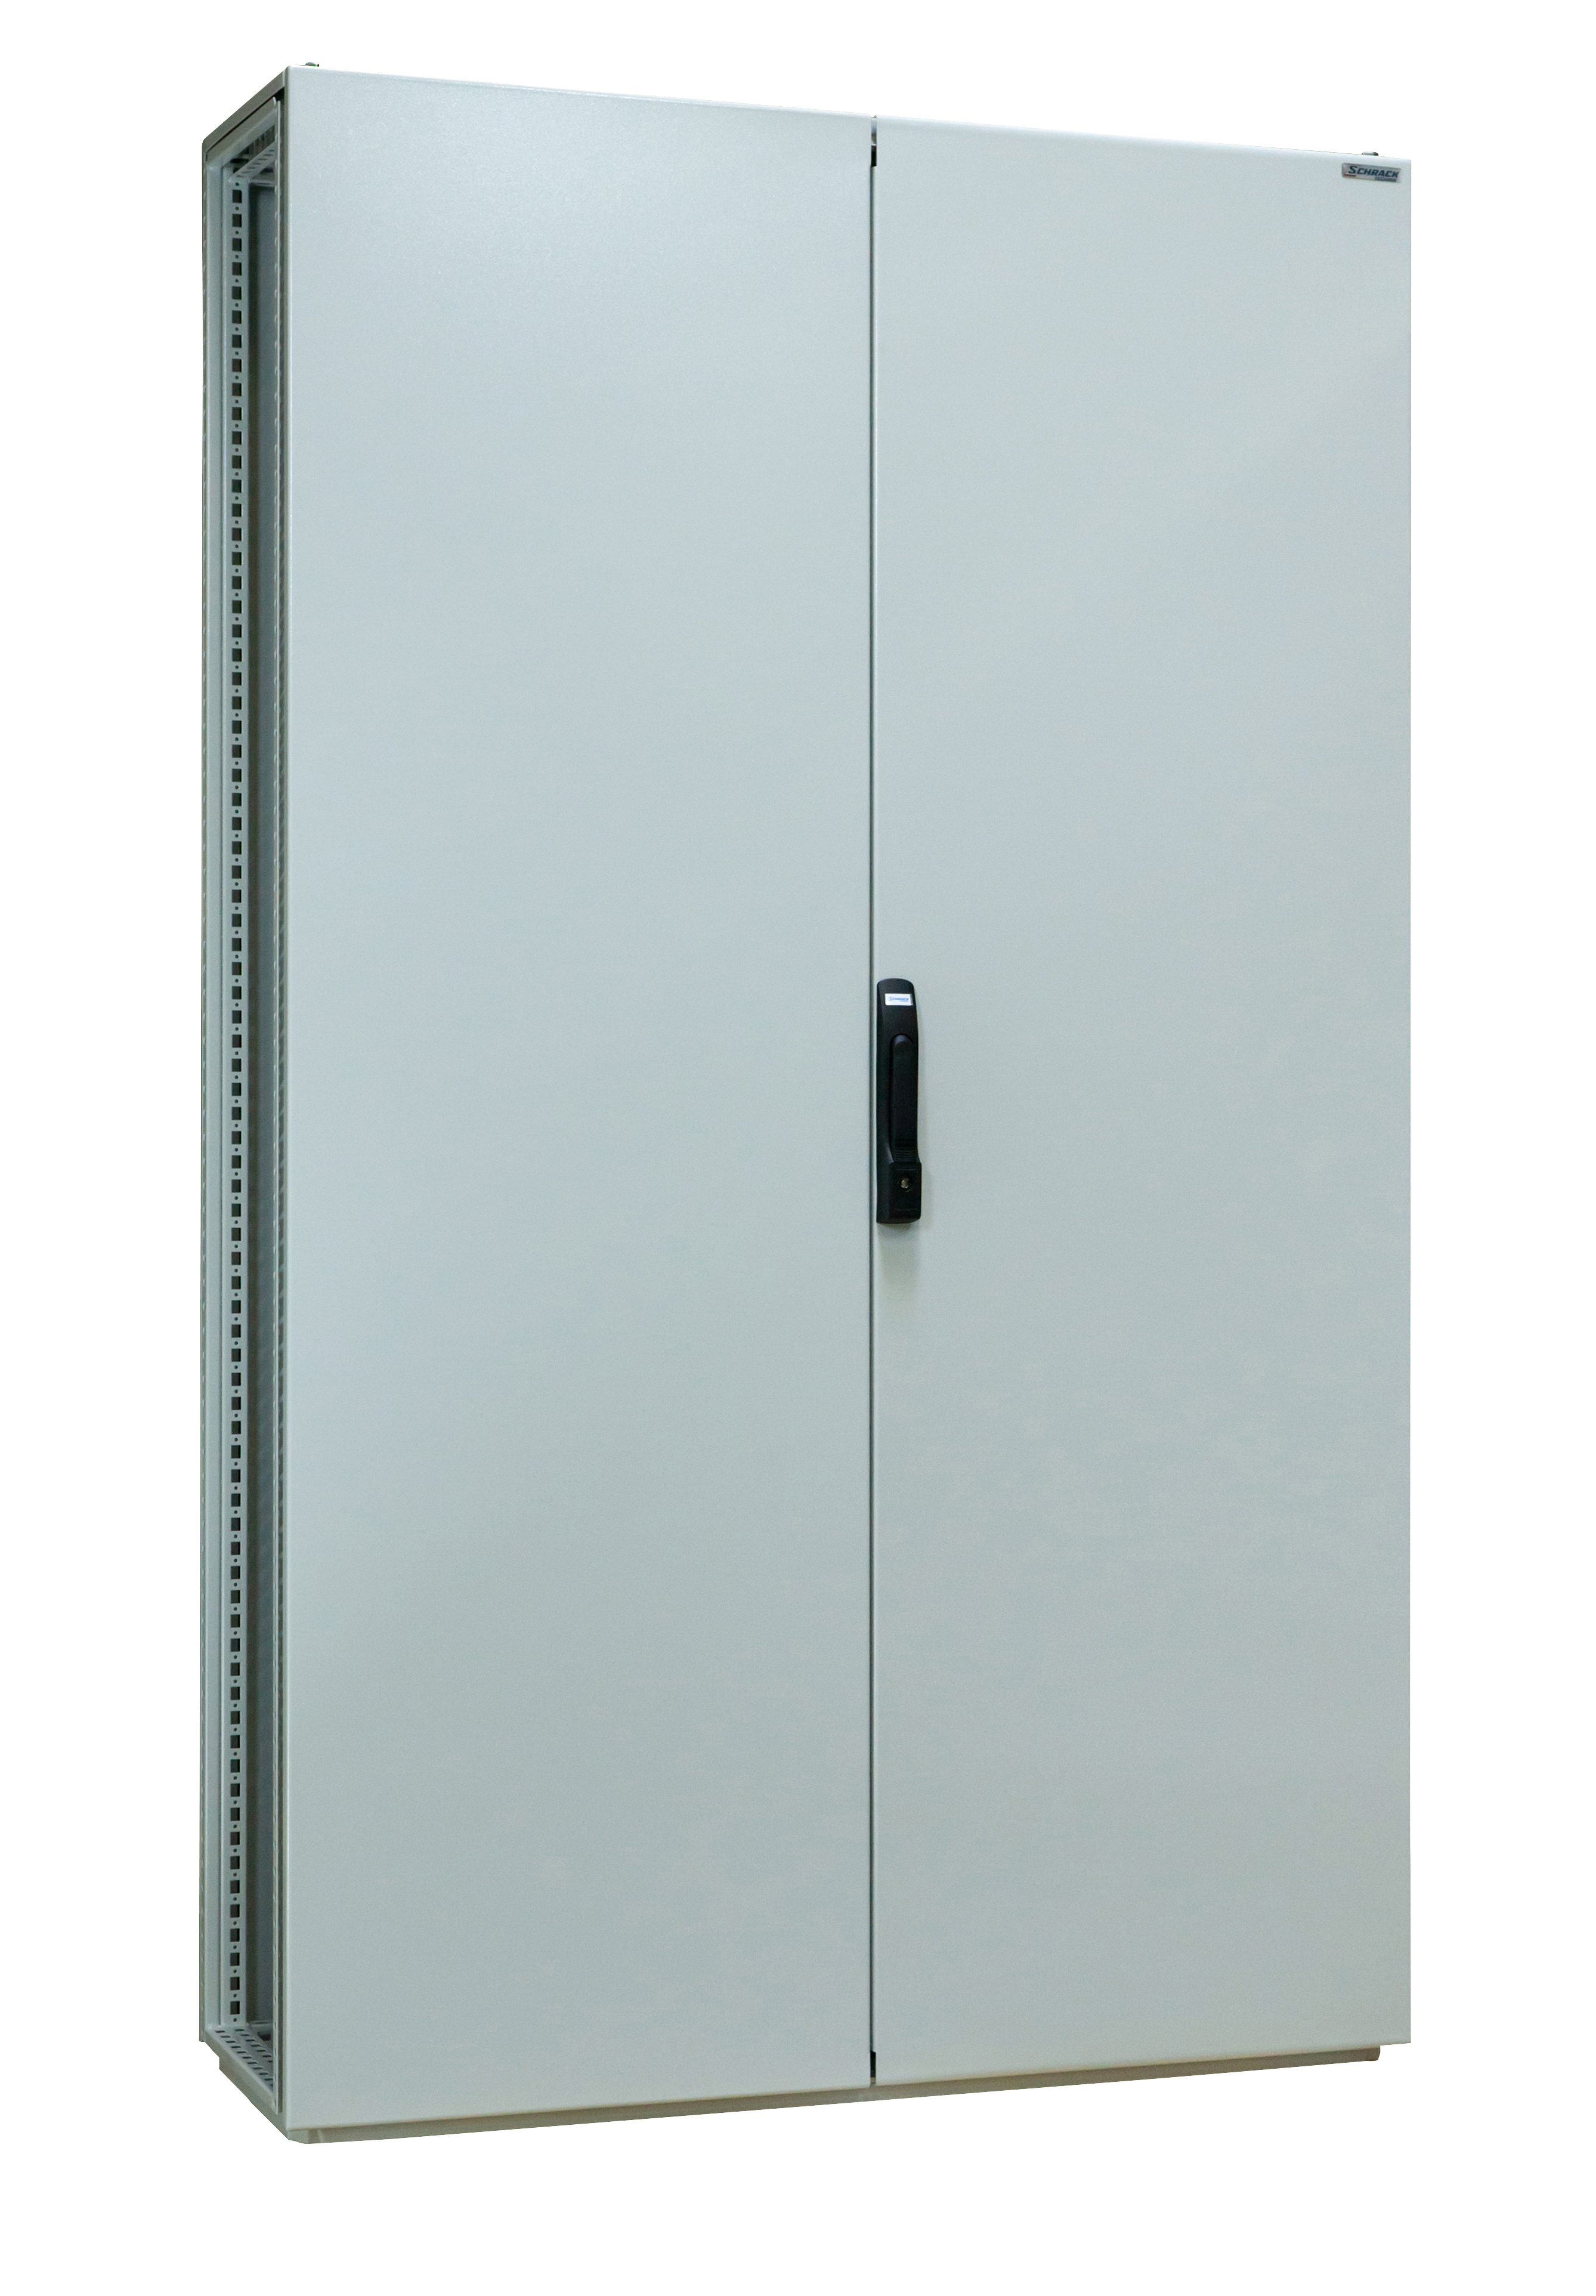 1 Stk Anreihschrank 2-türig, 2000x1200x500mm, RAL 7035 AS201252-5